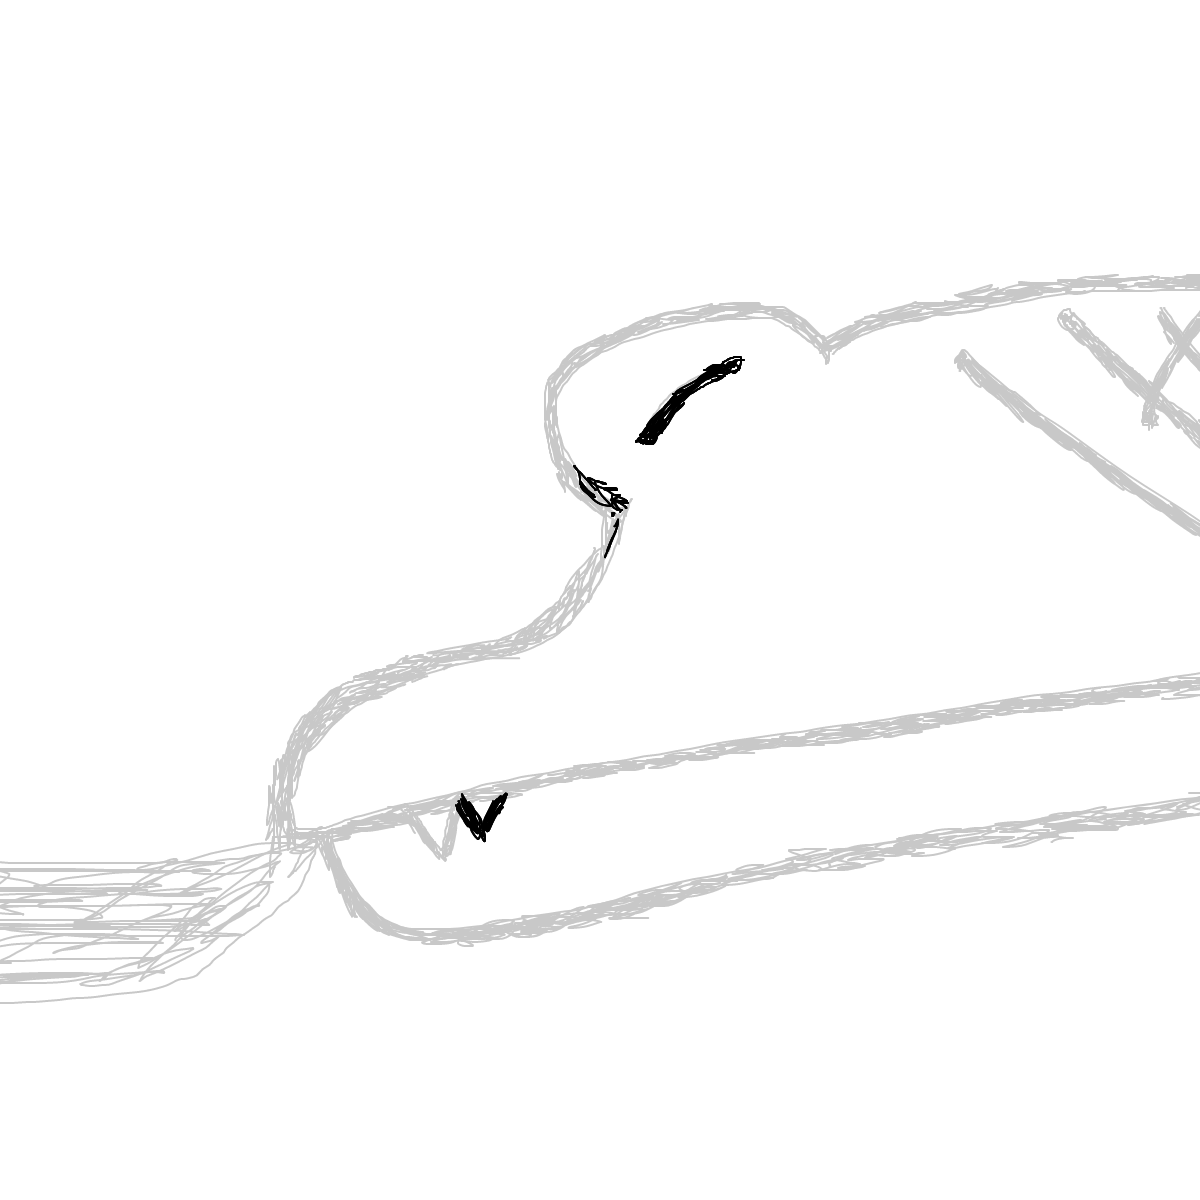 BAAAM drawing#23380 lat:46.5209388732910160lng: 6.6340351104736330